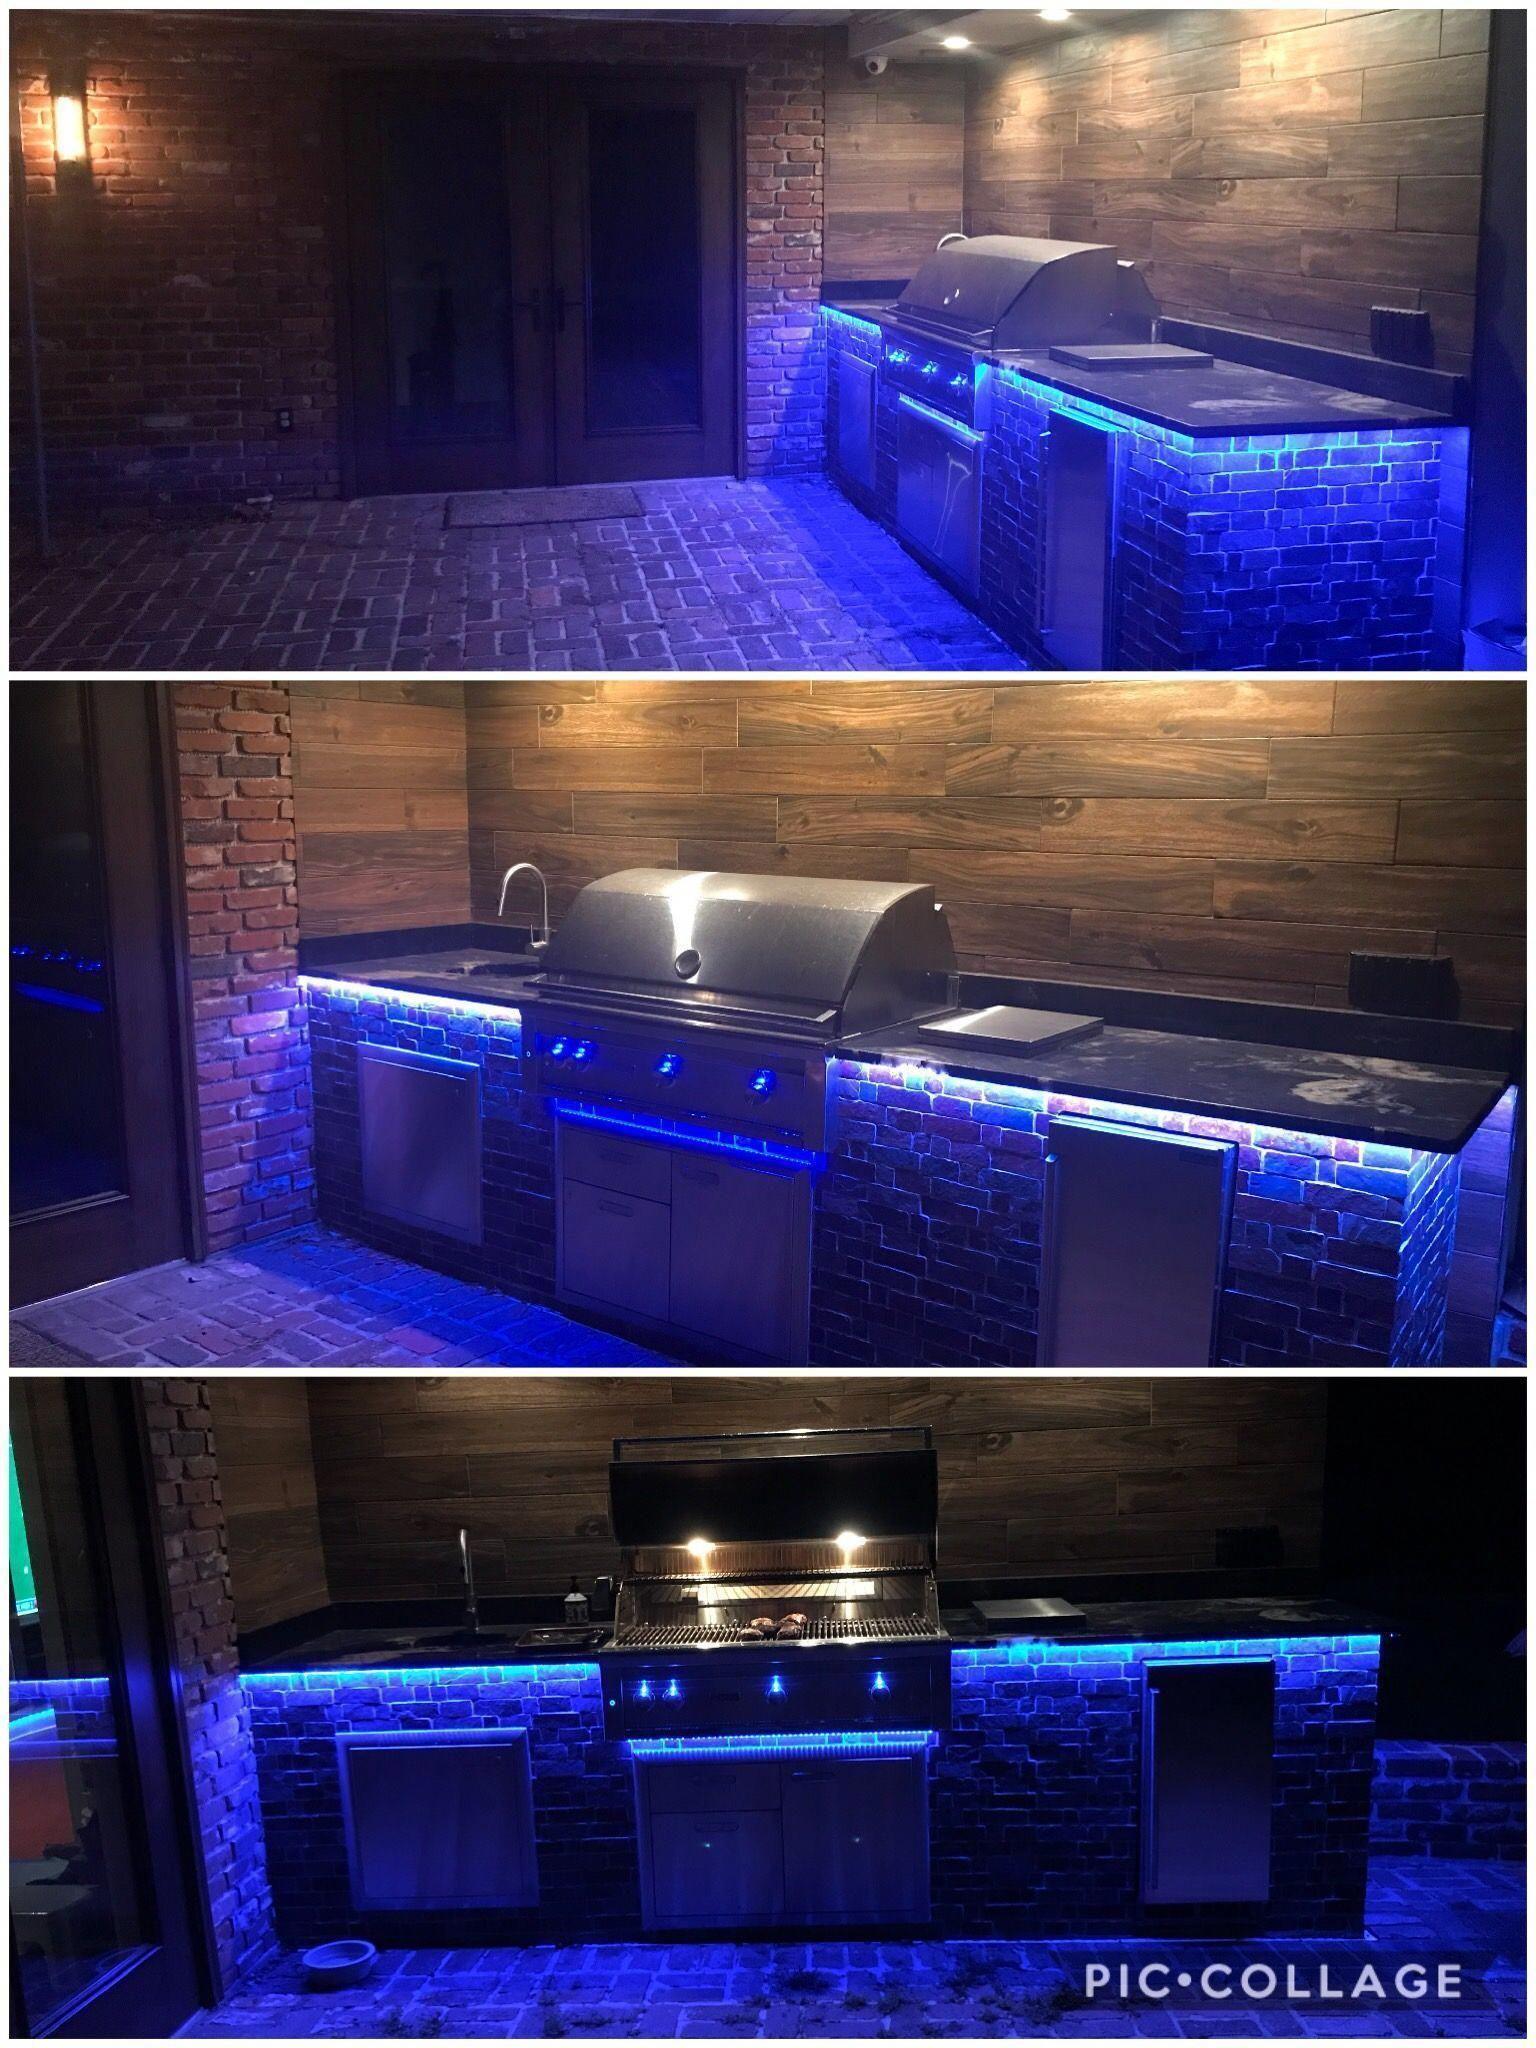 Paradise Outdoor Kitchens For Entertaining Guests Outdoor Kitchen Bars Outdoor Kitchen Rustic Outdoor Kitchens